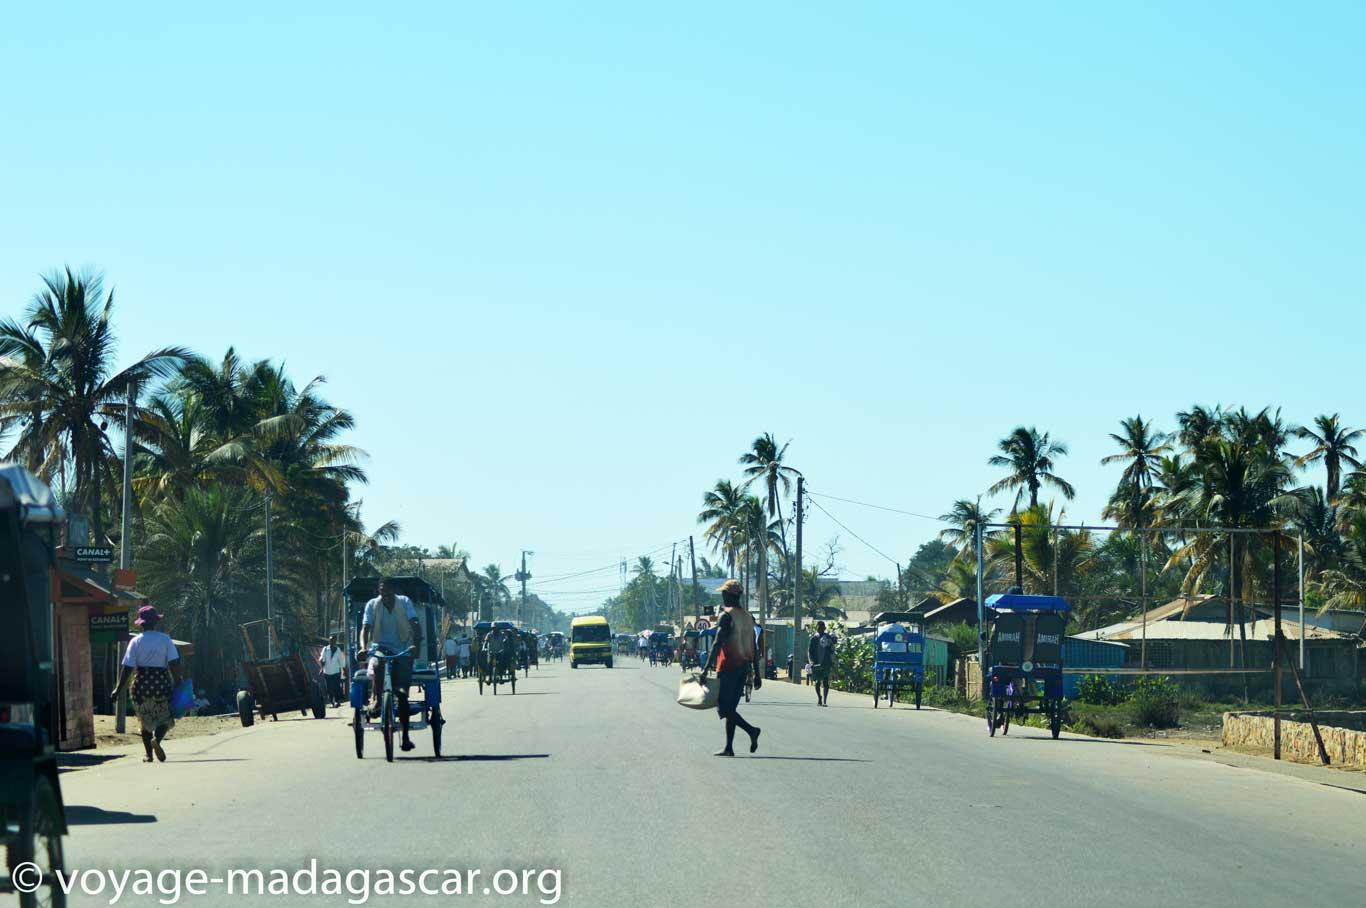 La ville de Morondava Madagascar